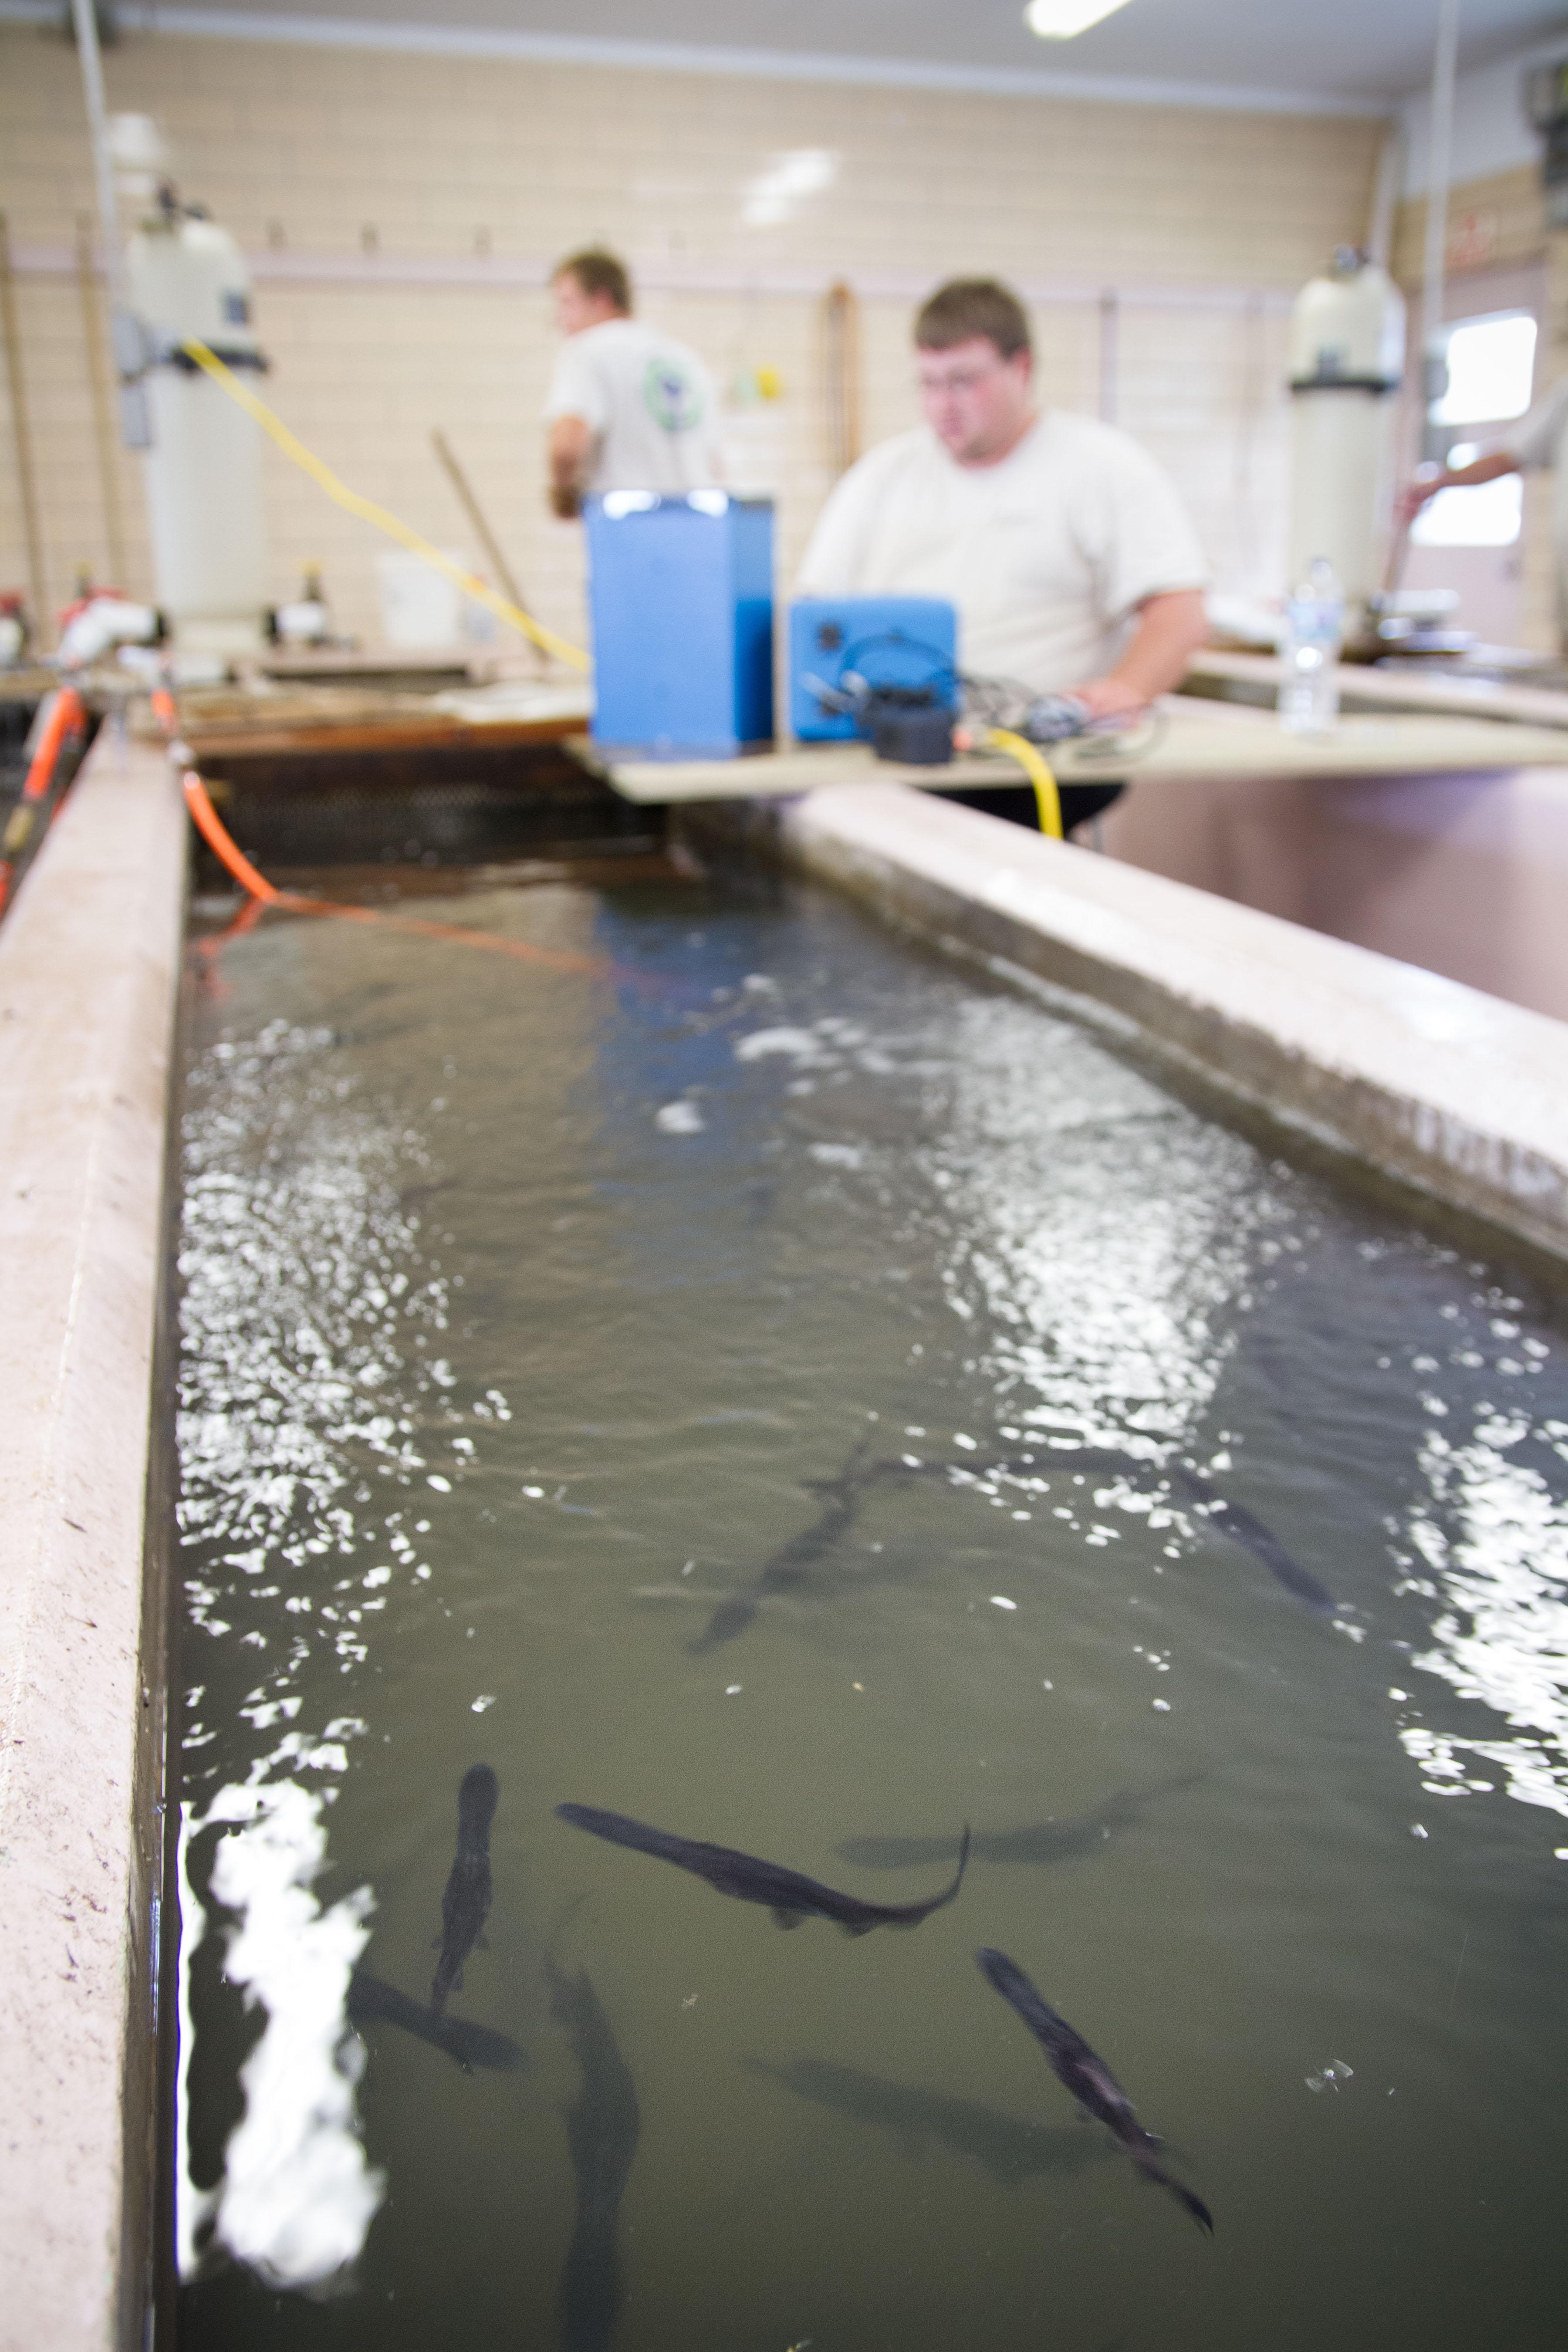 A biologist tagging Paddlefish at Gavins Point National Fish Hatchery (credits: Sam Stukel / USFWS / Flickr Creative Commons Attribution 2.0 Generic (CC BY 2.0))